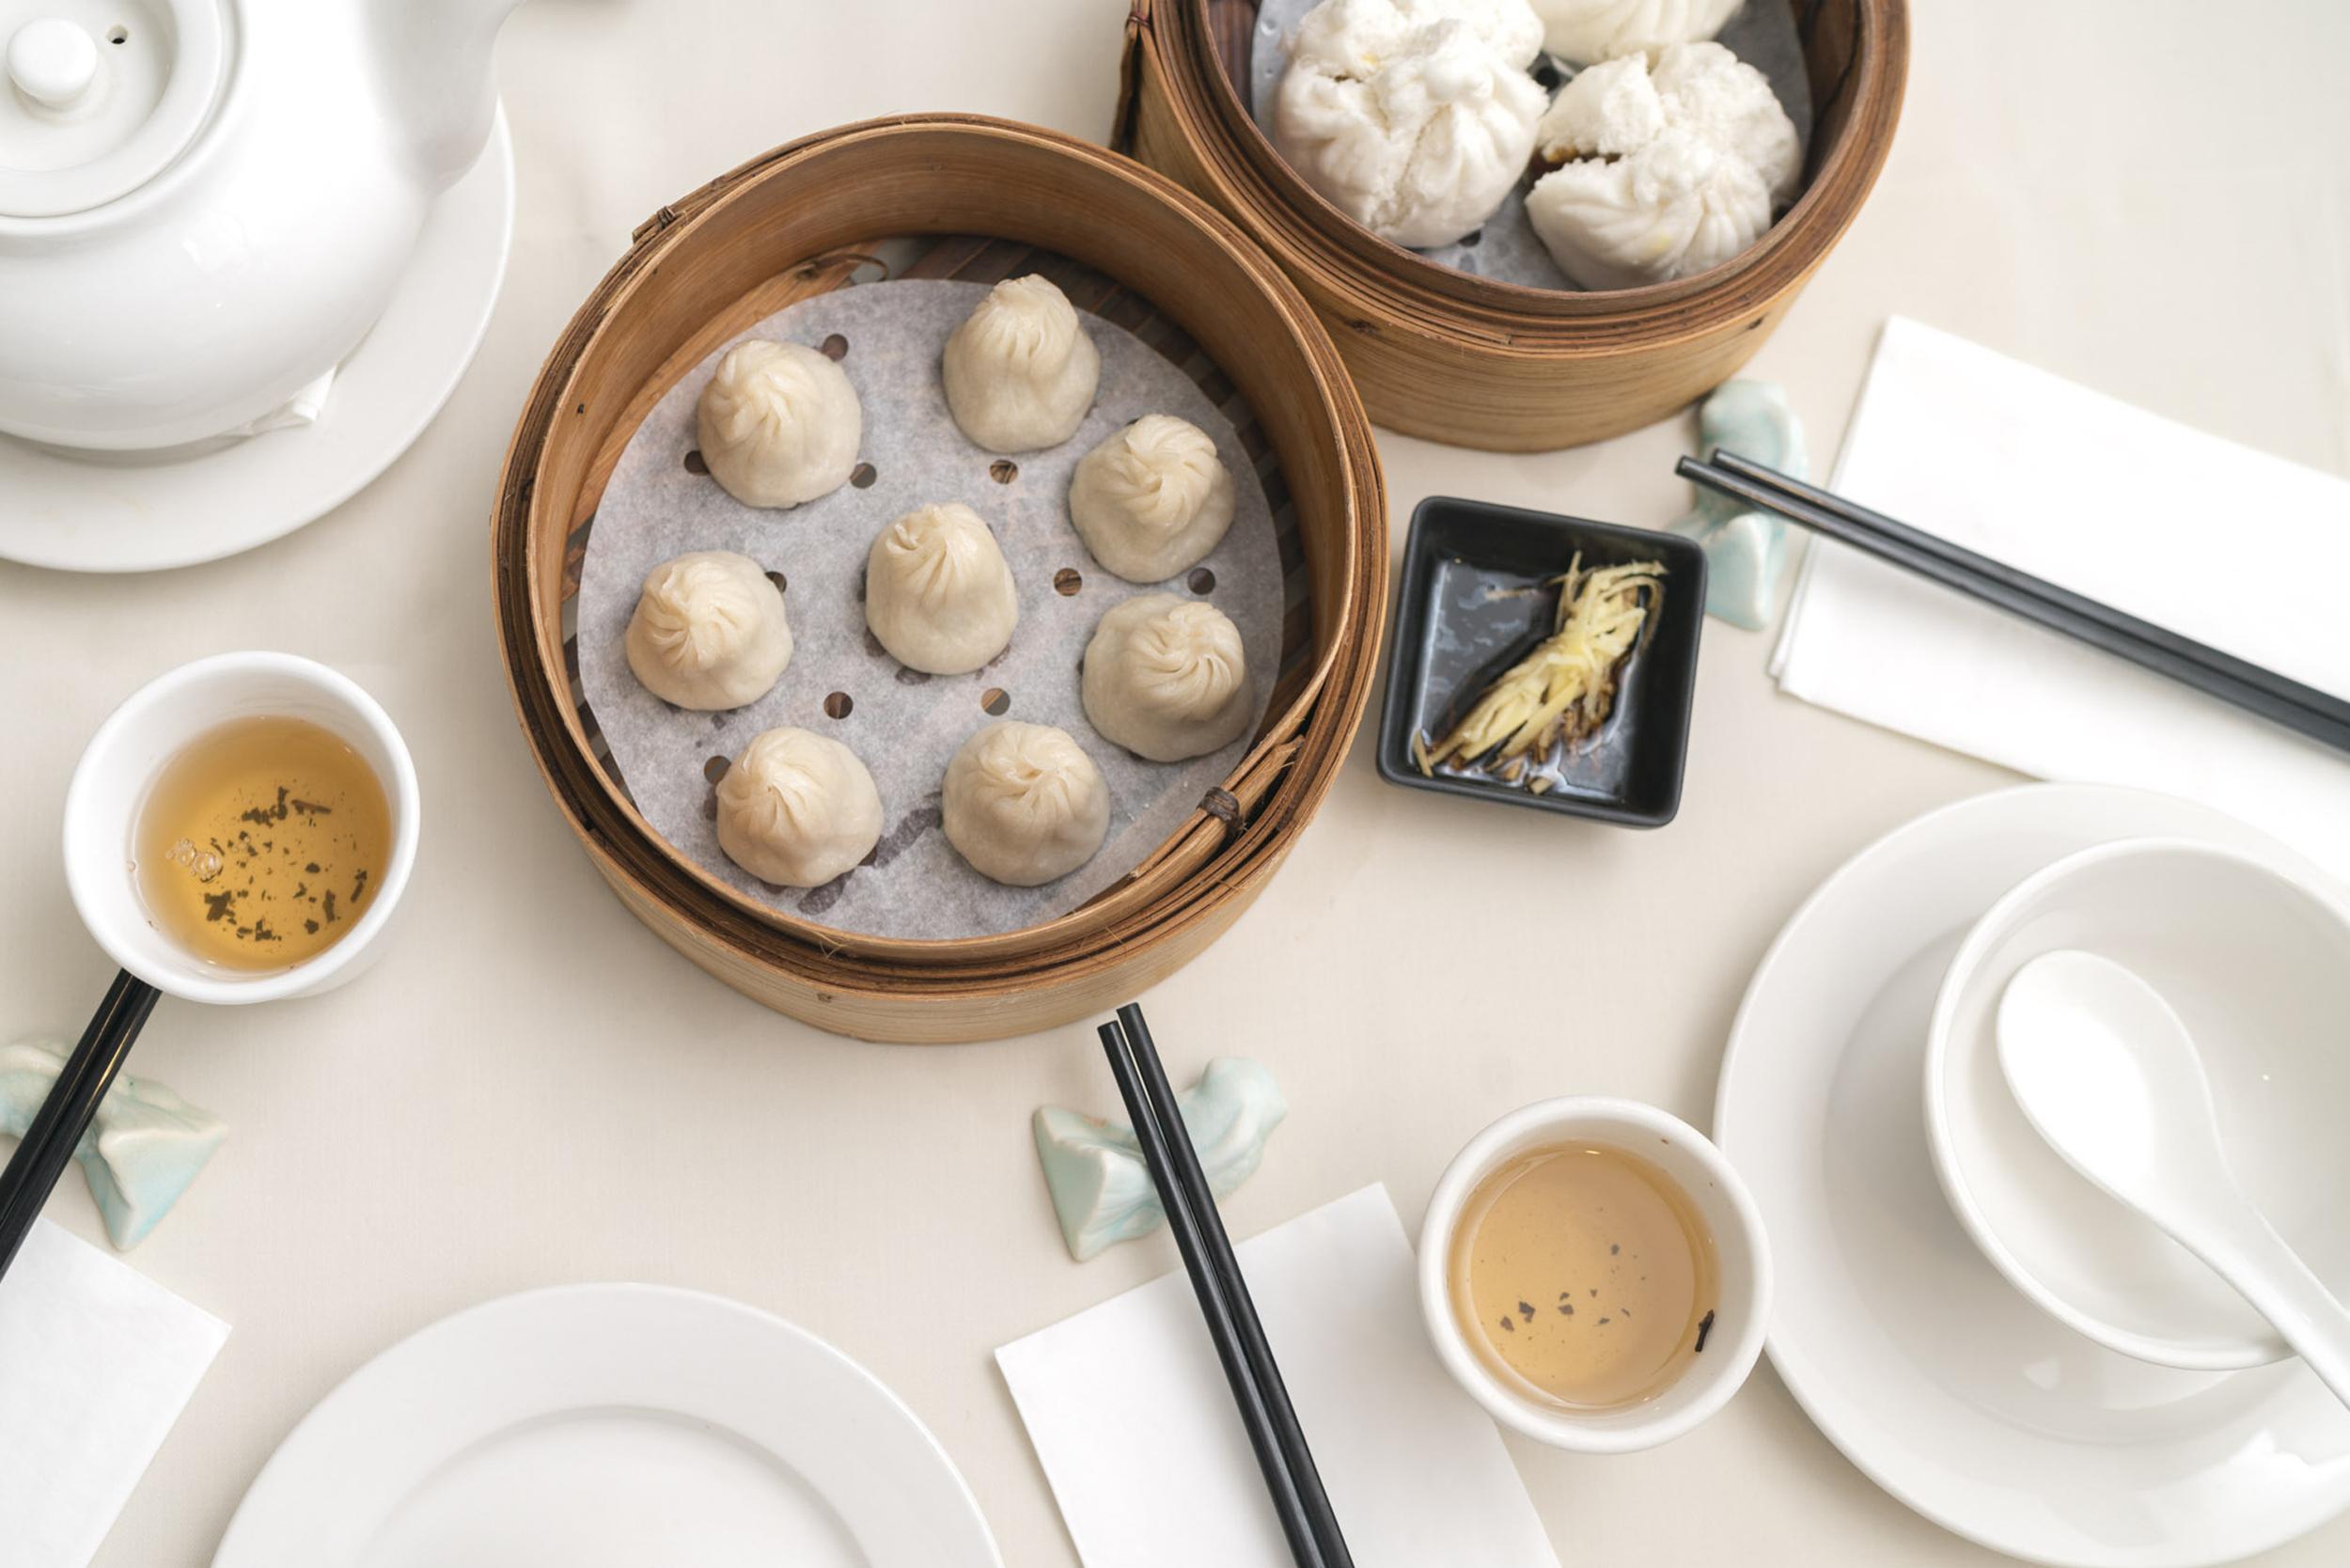 A bamboo steamer filled with dumplings at Dumplings Legend Chinatown London